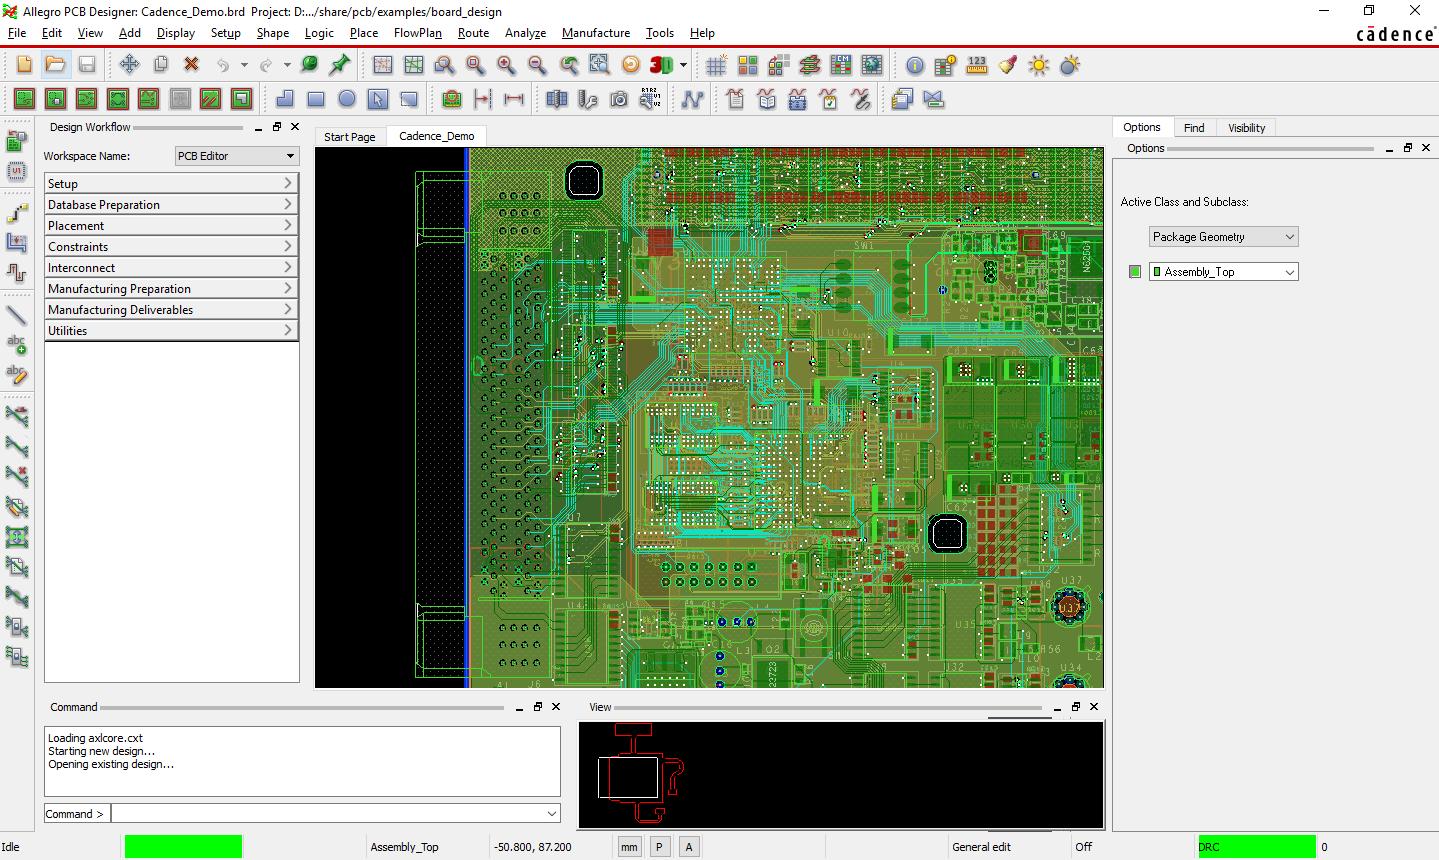 Working with Cadence SPB-OrCAD (Allegro SPB) 17.20.S049 win64 full